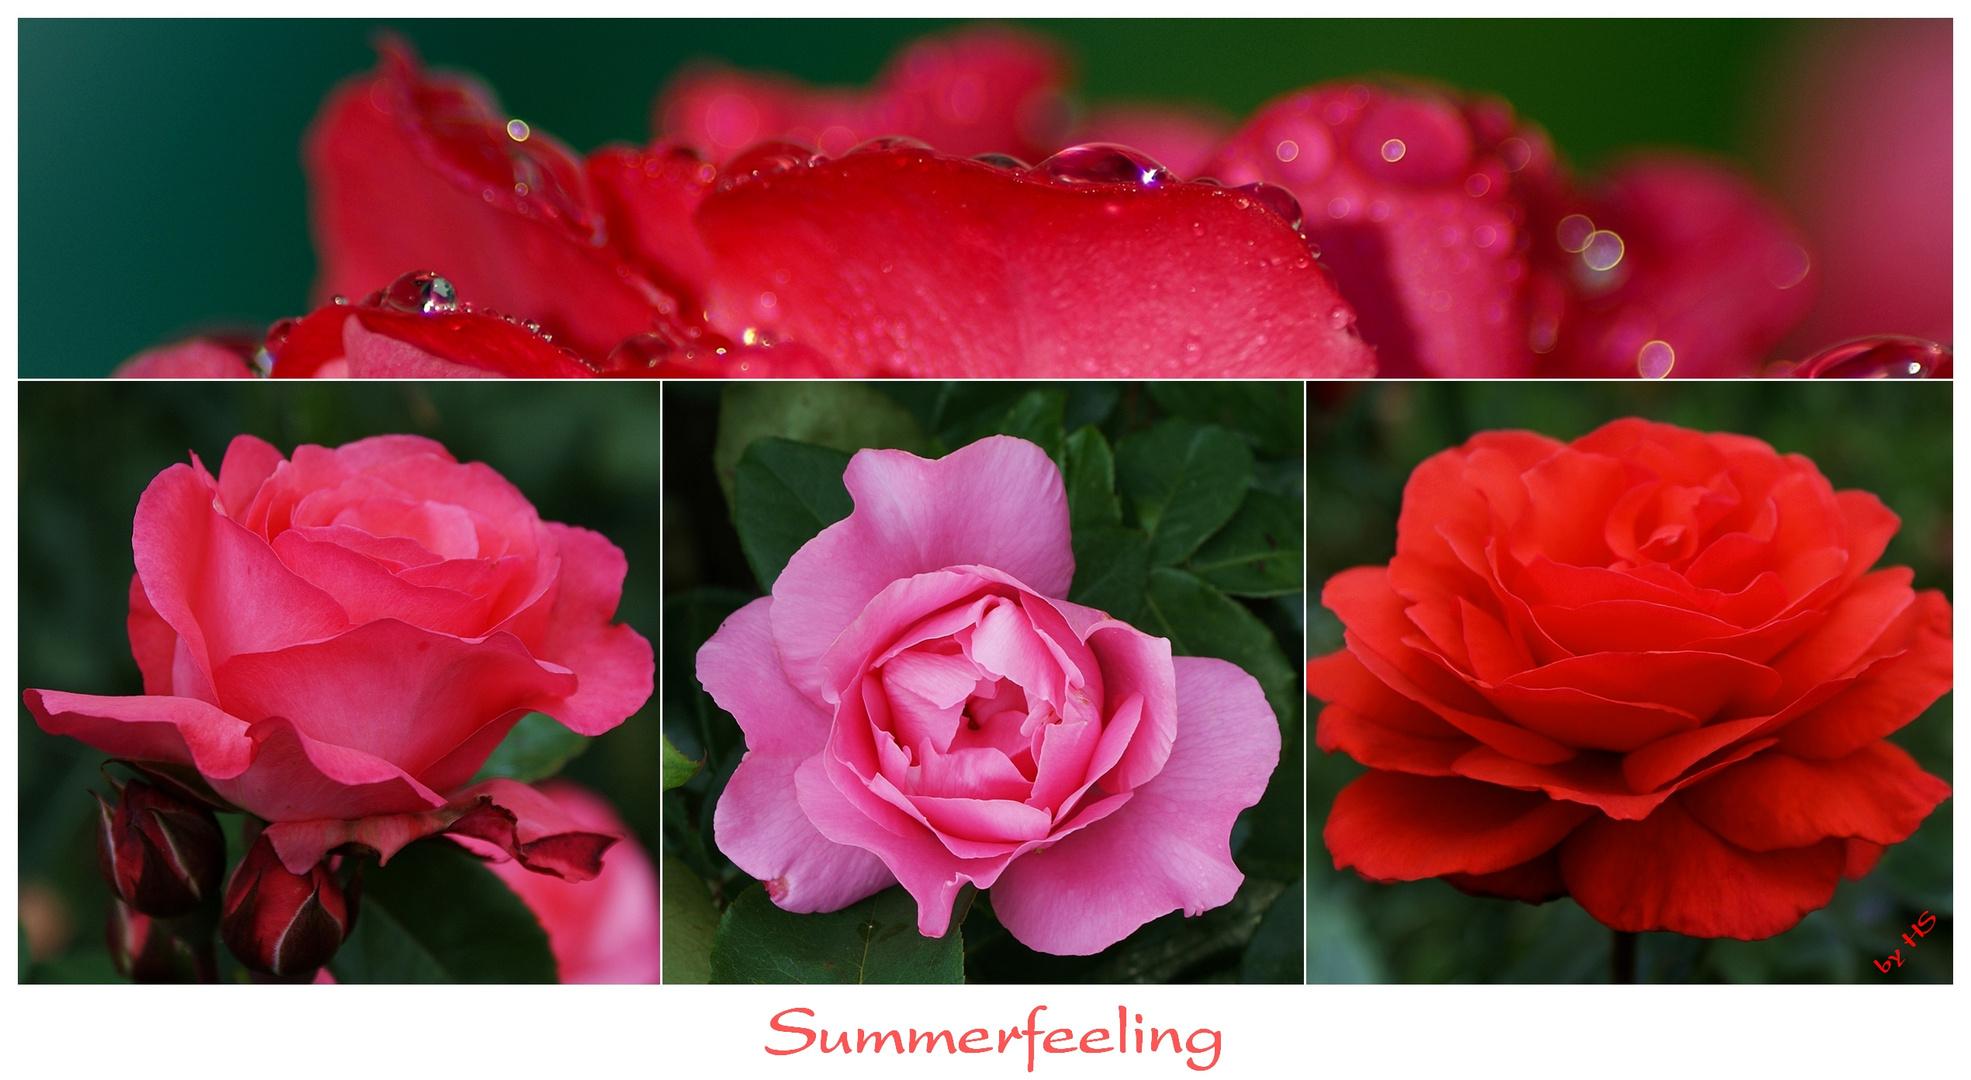 Summerfeeling...